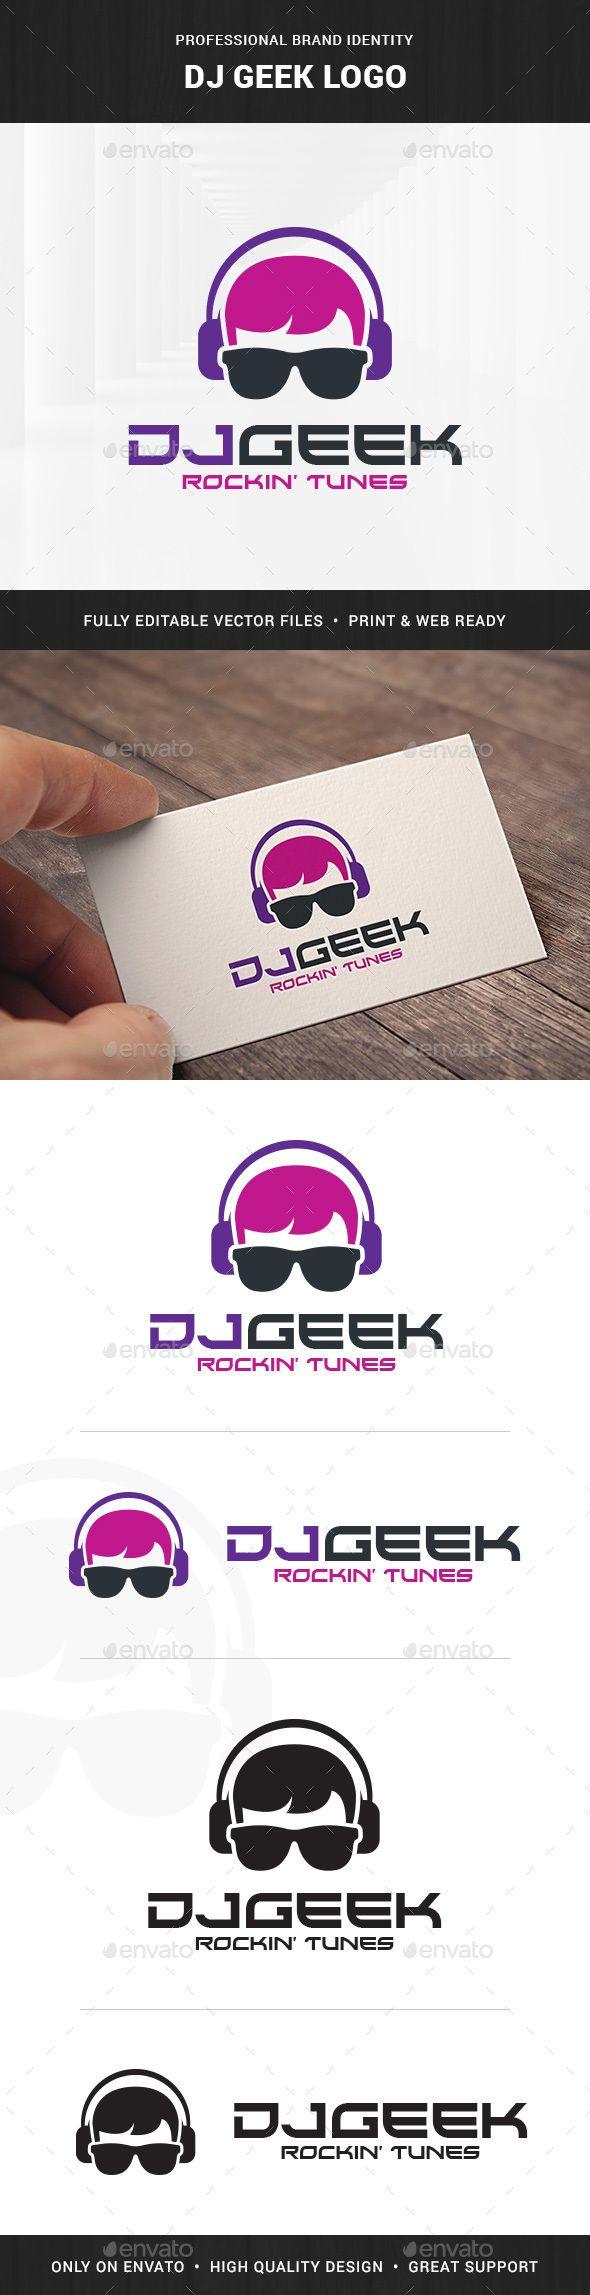 DJ Geek Logo Template | Pinterest | Logo templates, Dj and Template